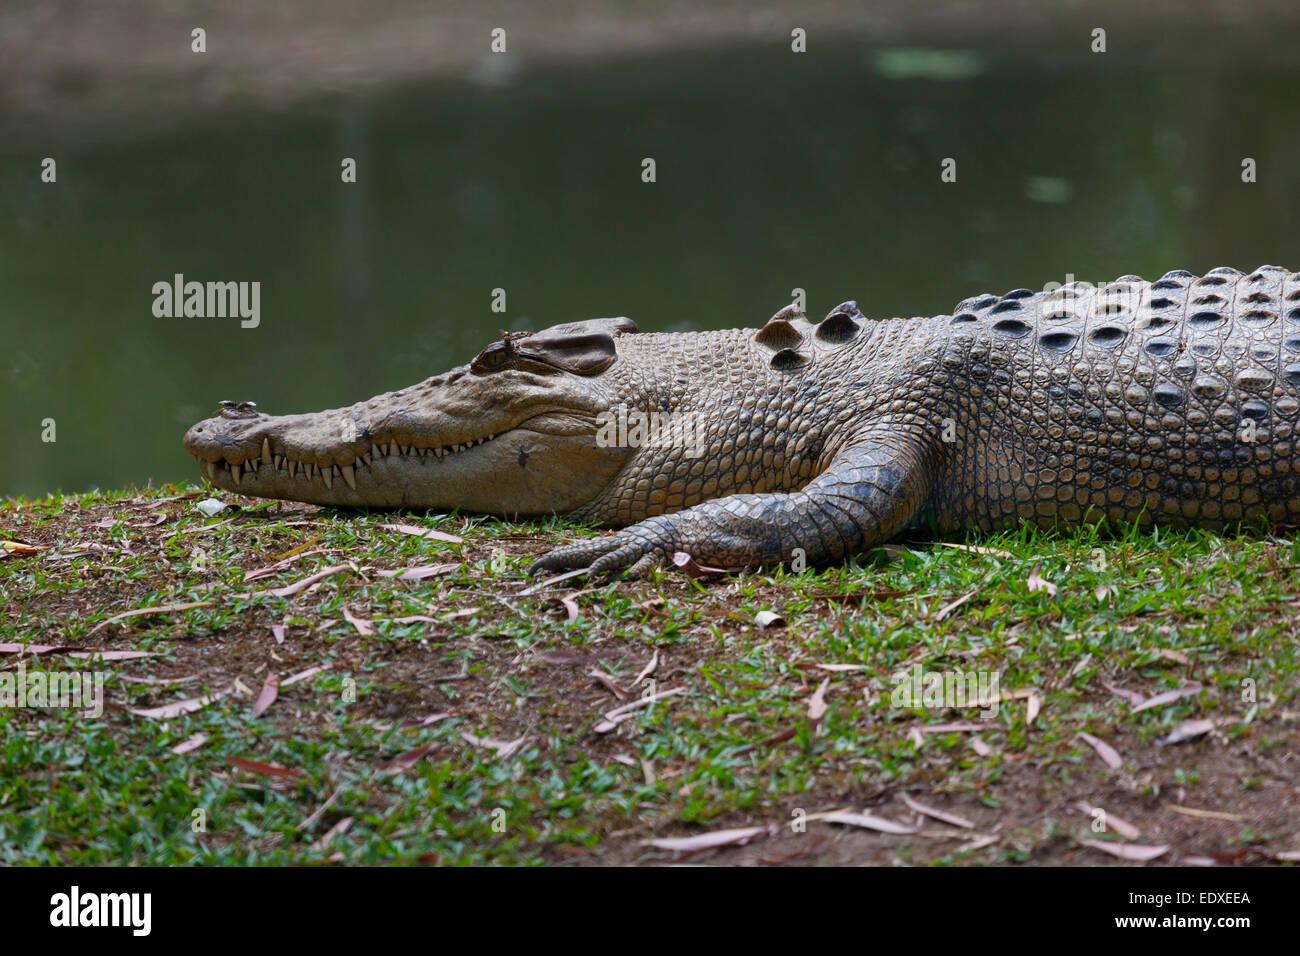 Crocodile in the Australian Zoo, Beerwah,Australia - Stock Image